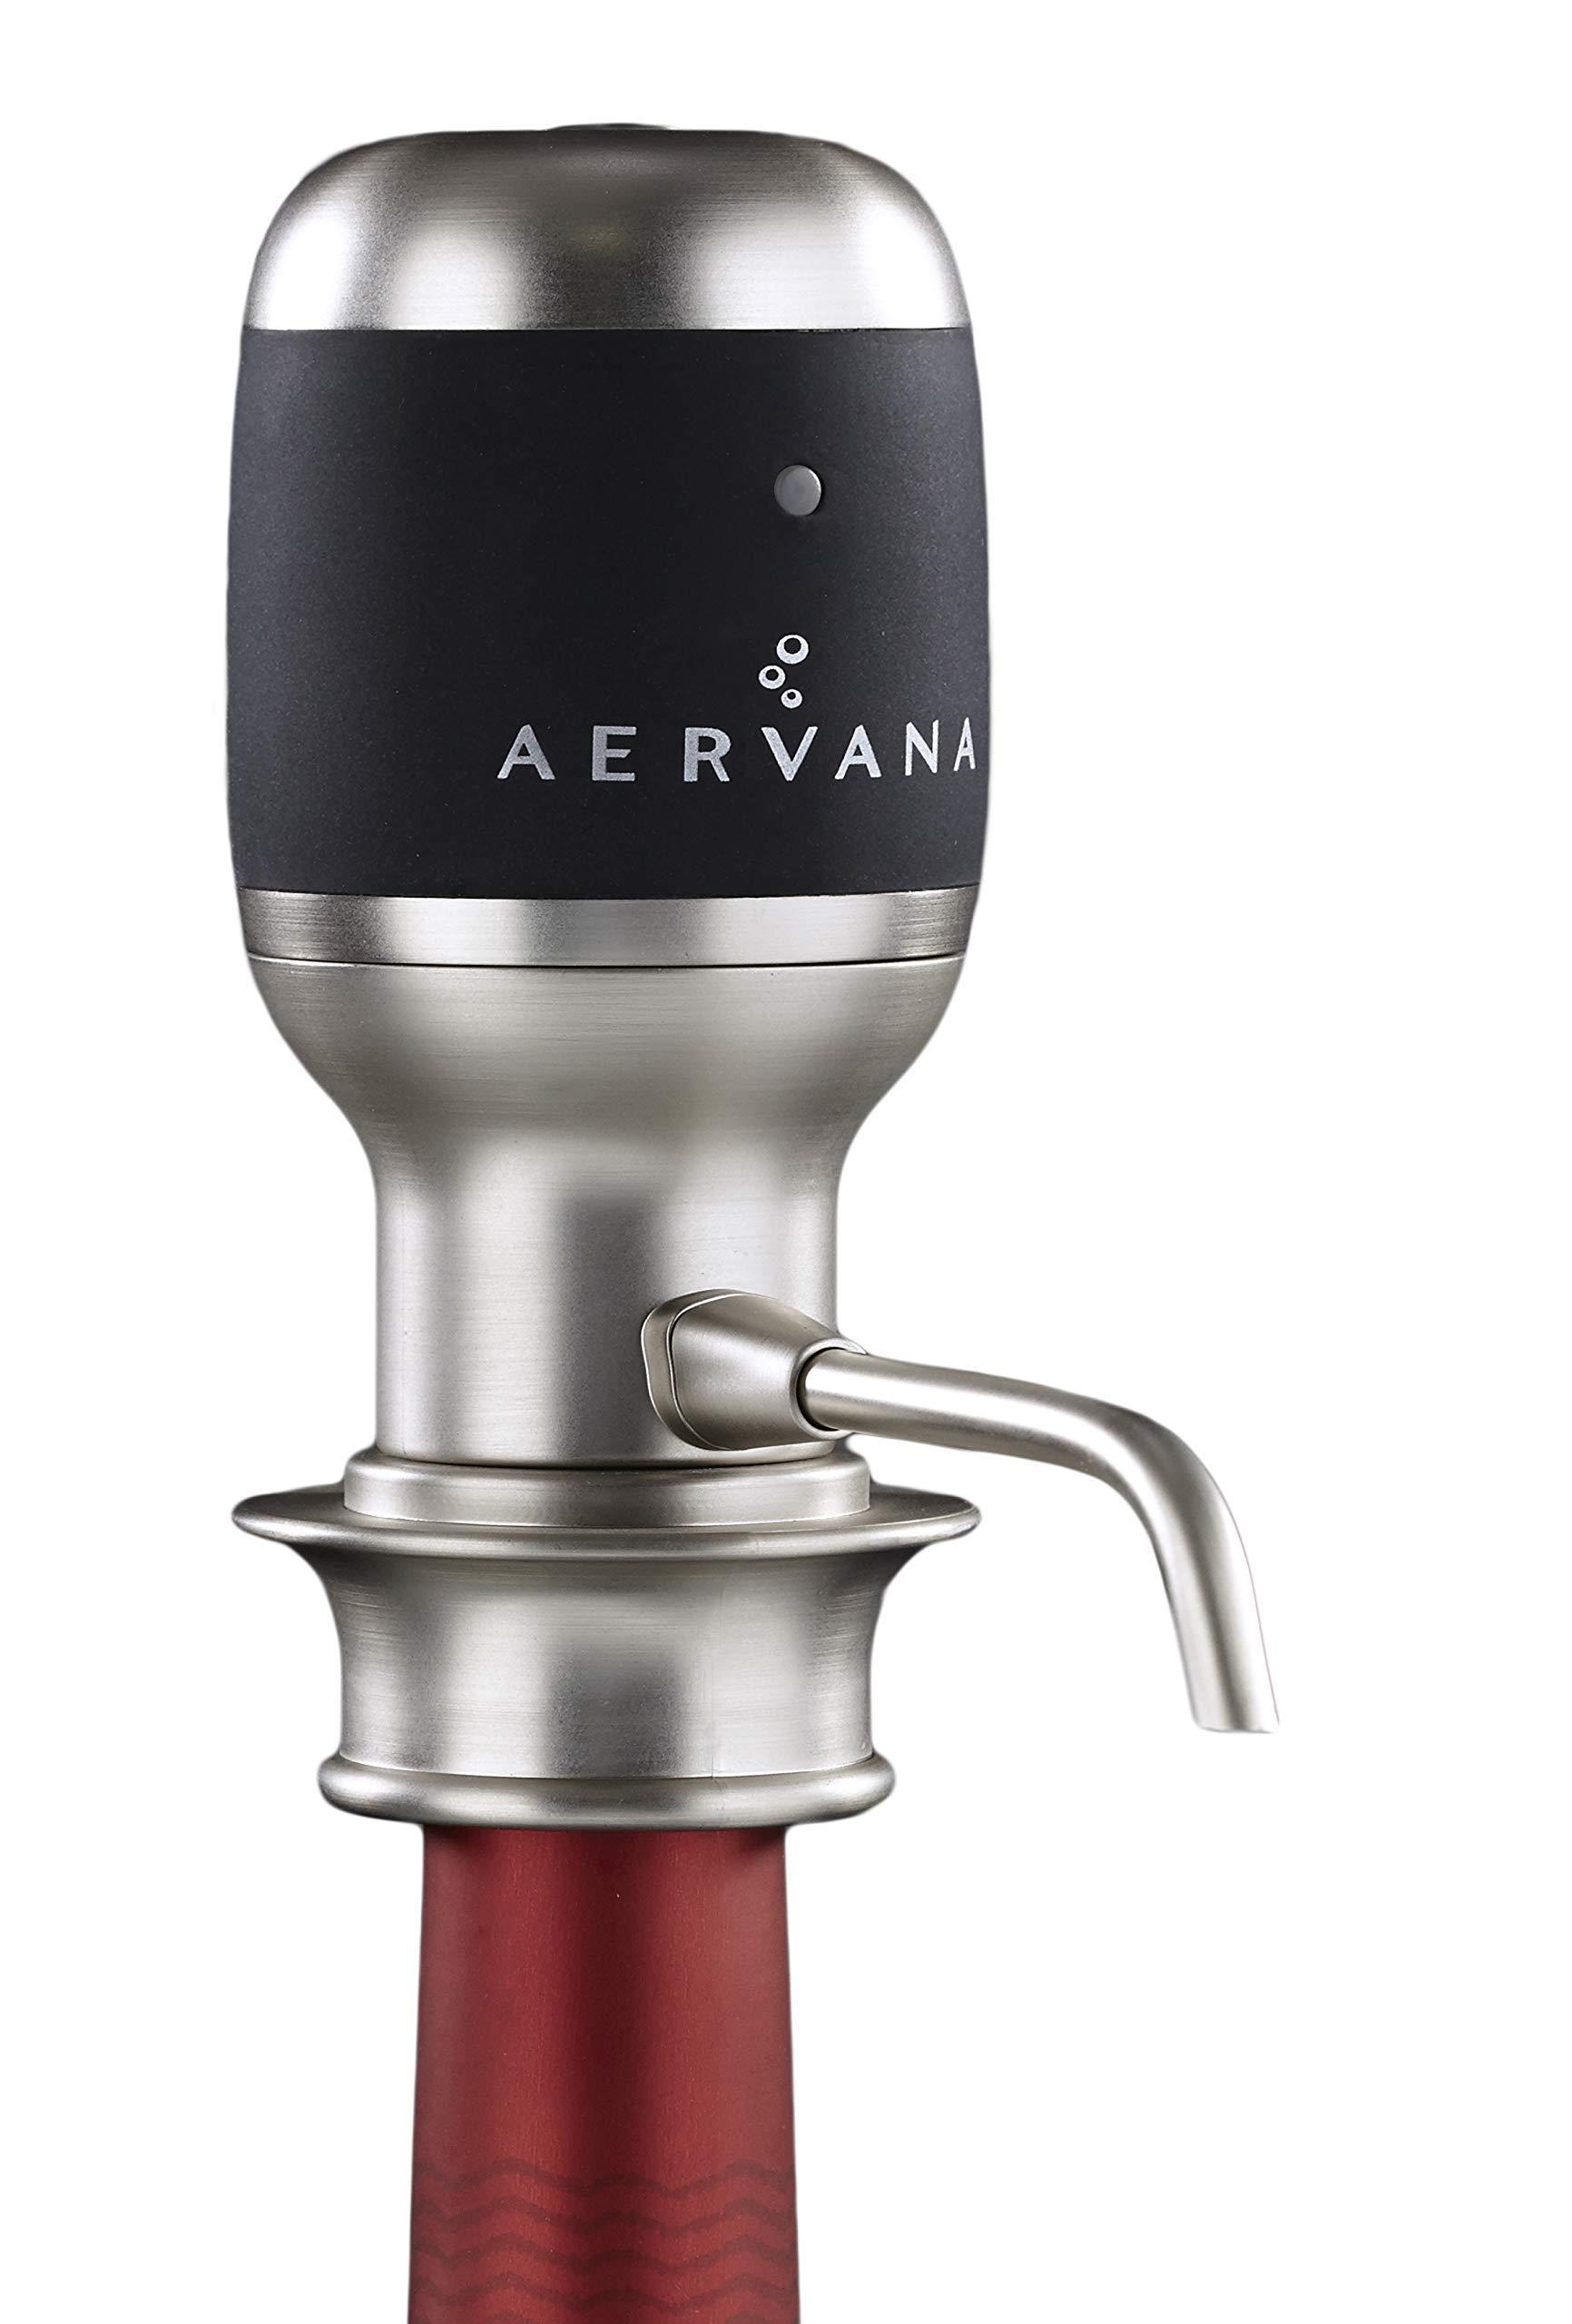 Aervana Original: 1 Touch Luxury Wine Aerator by Aervana